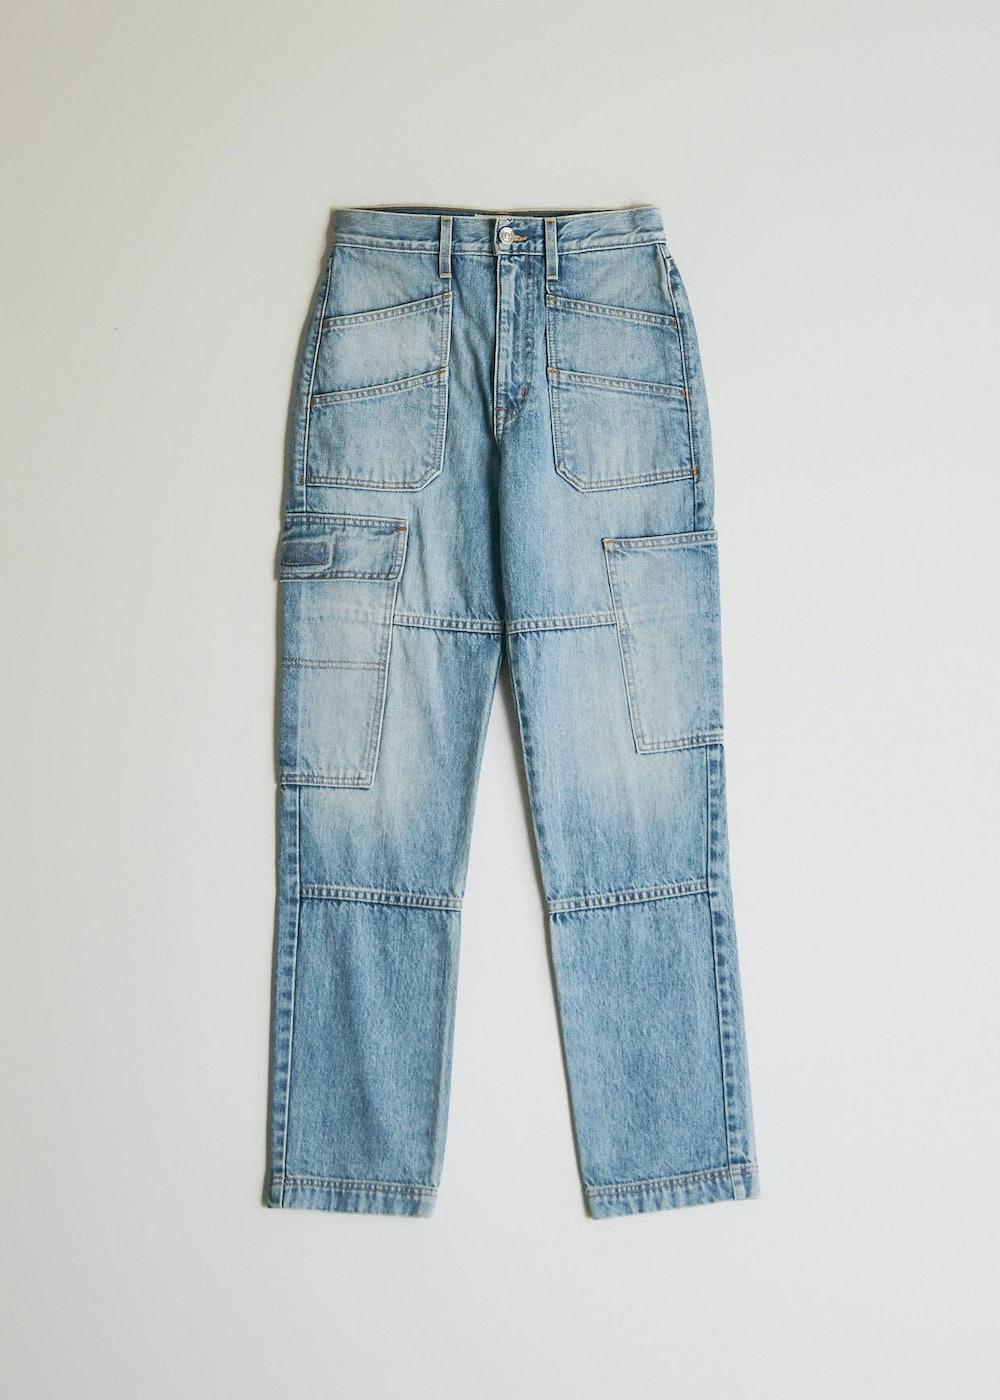 Savior Cargo Jean in Salt Flats Blue